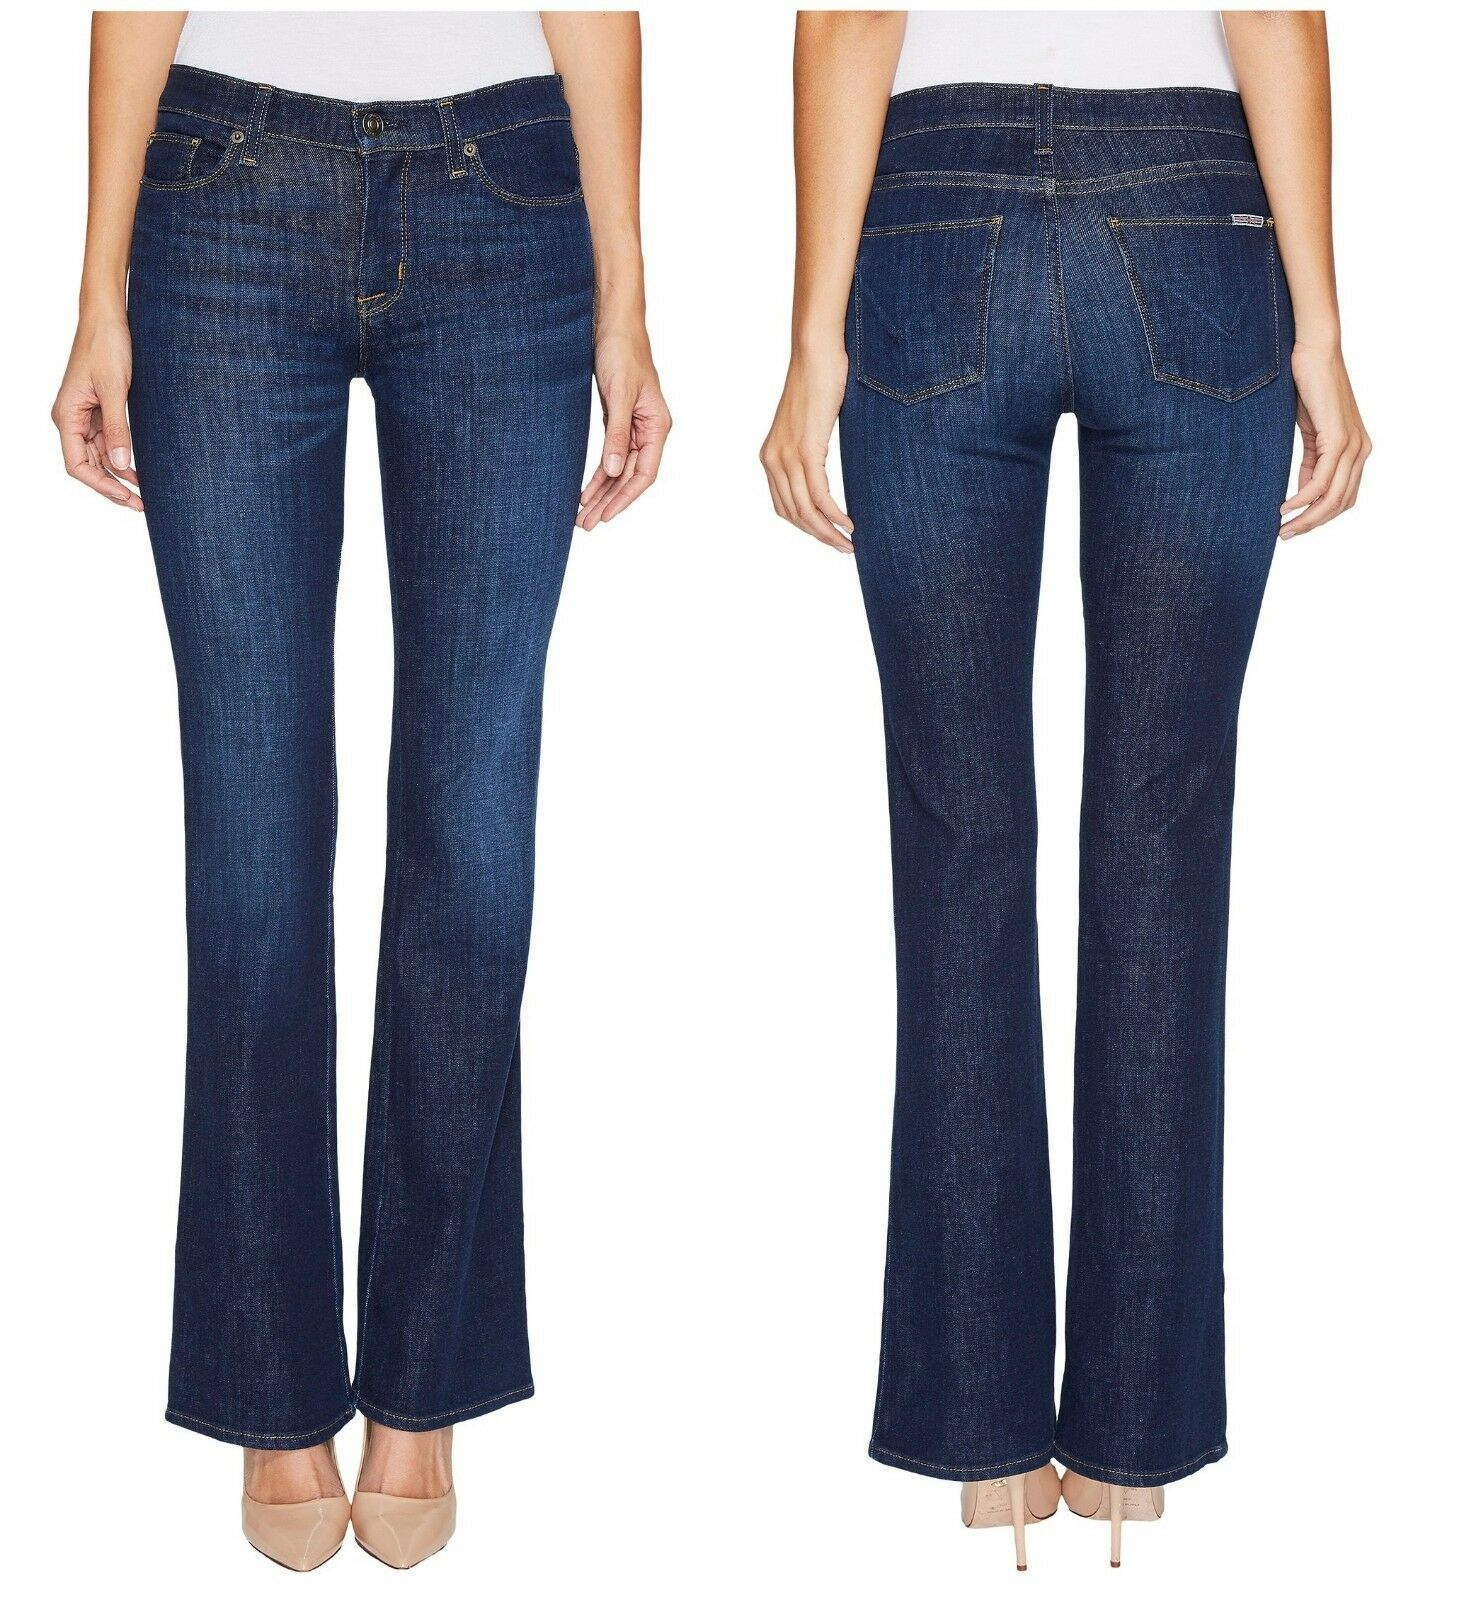 New Hudson Designer Brand Women MidRise Drew BootCut Stretchy Denim Jeans